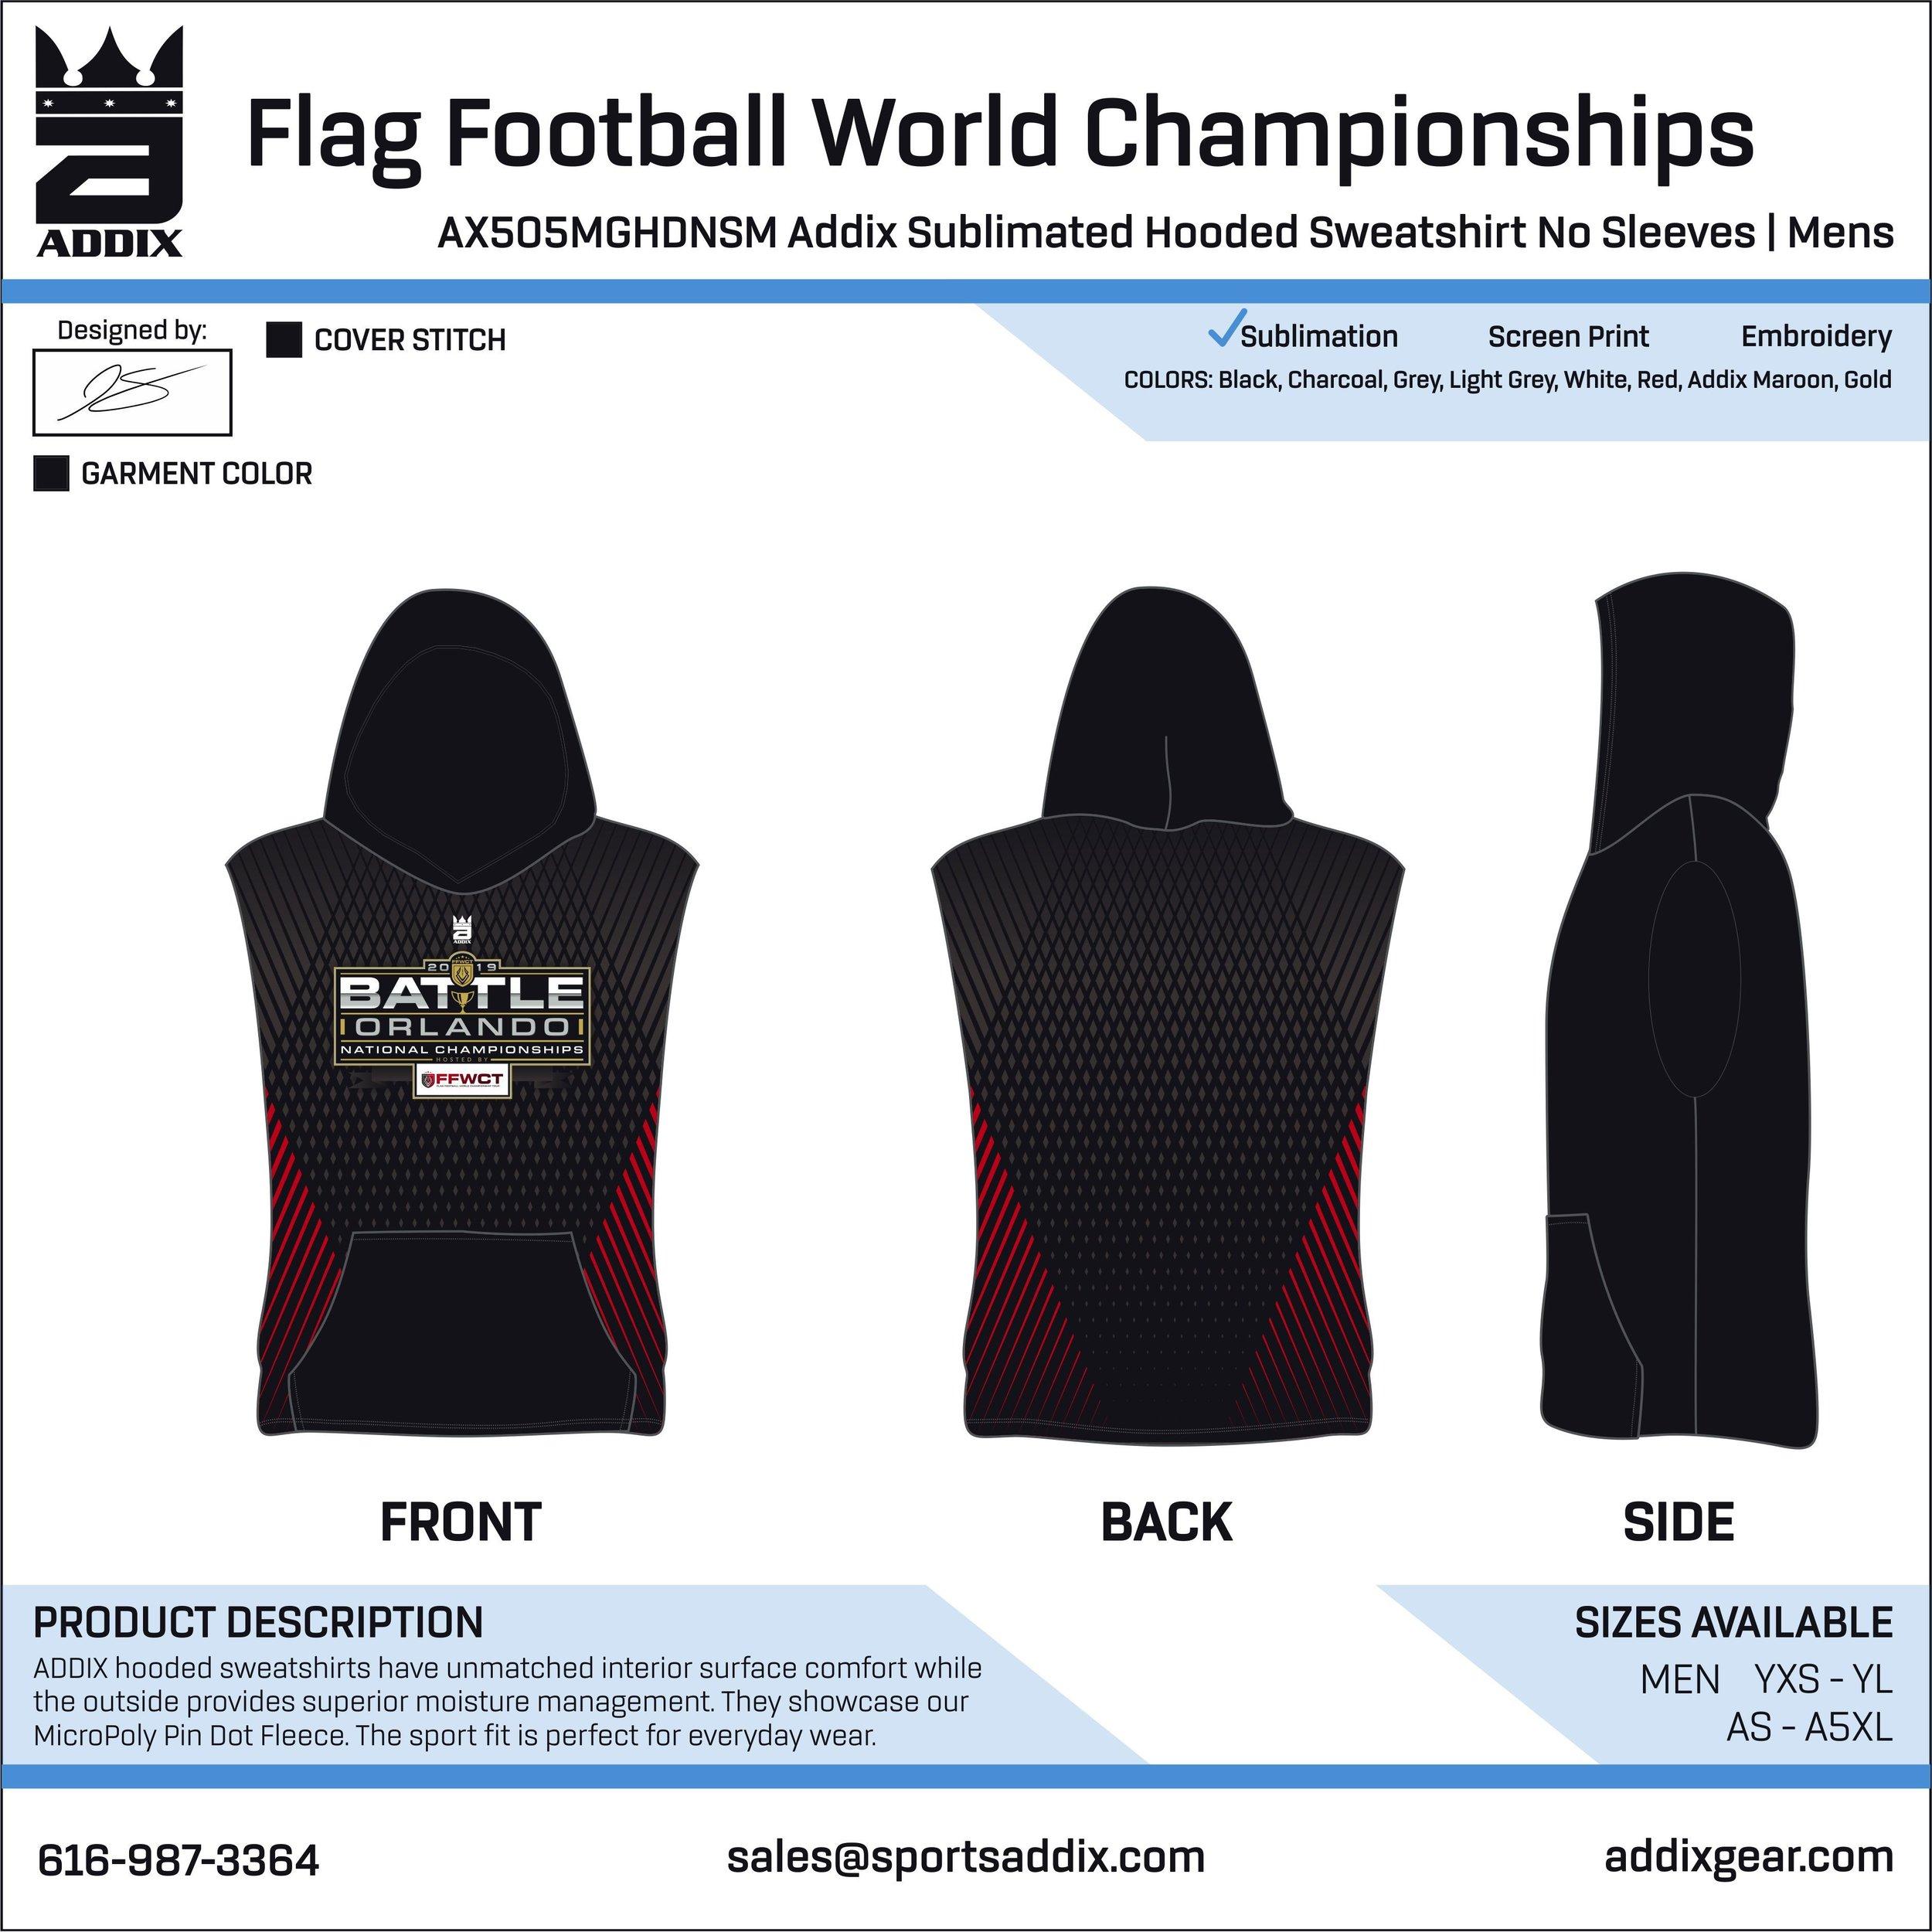 Flag Football World Championships_2018_12-20_JE_Sleeveless Full Sub Hoodie.jpg